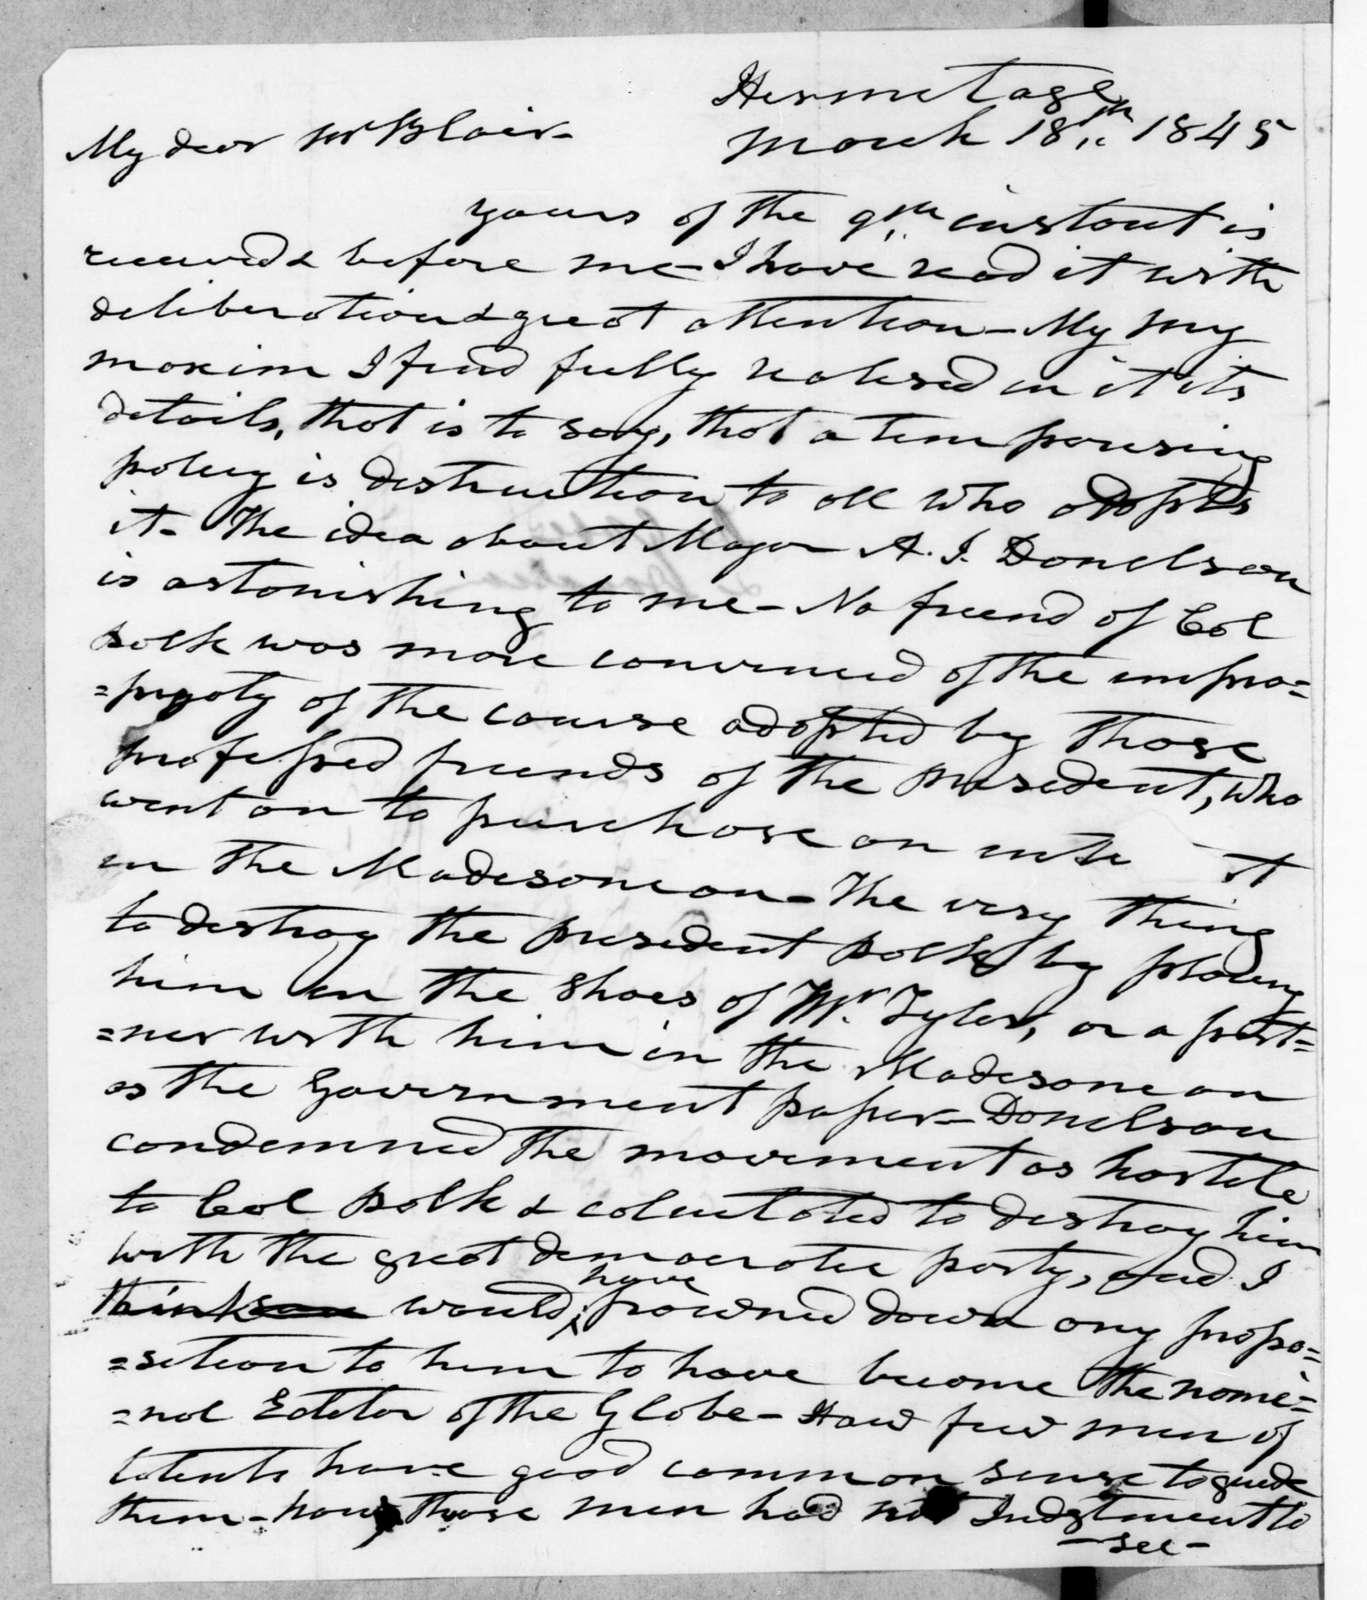 Andrew Jackson to Francis Preston Blair, March 18, 1845